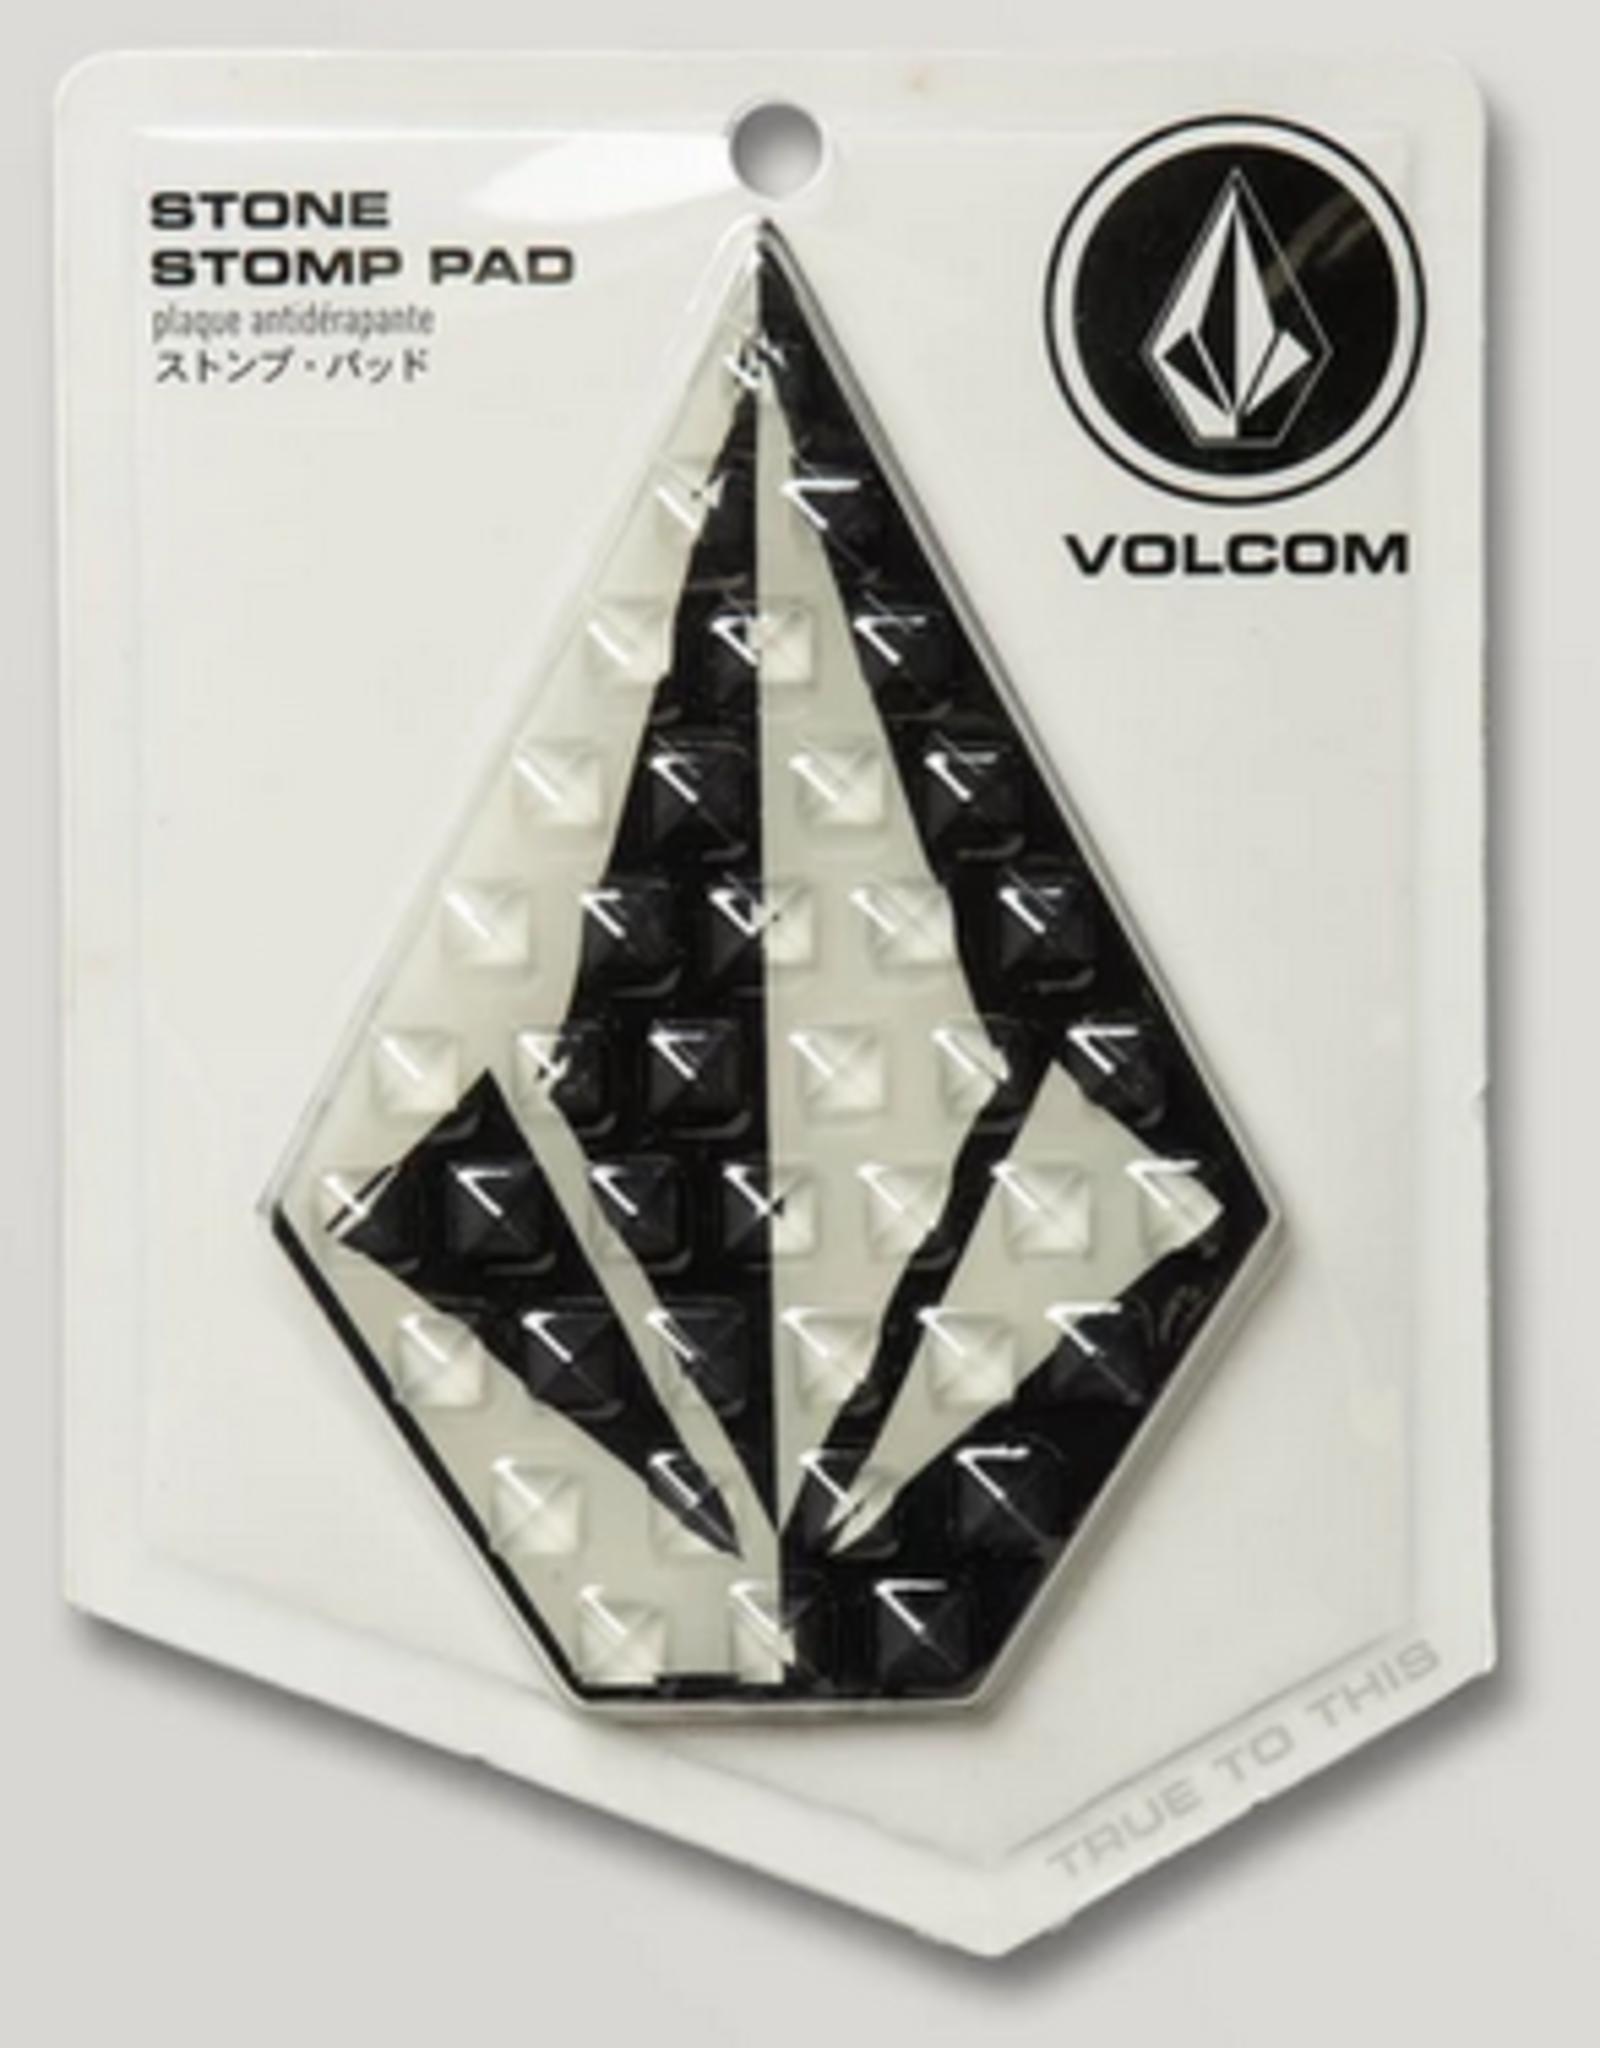 VOLCOM VOLCOM STONE STOMP PAD